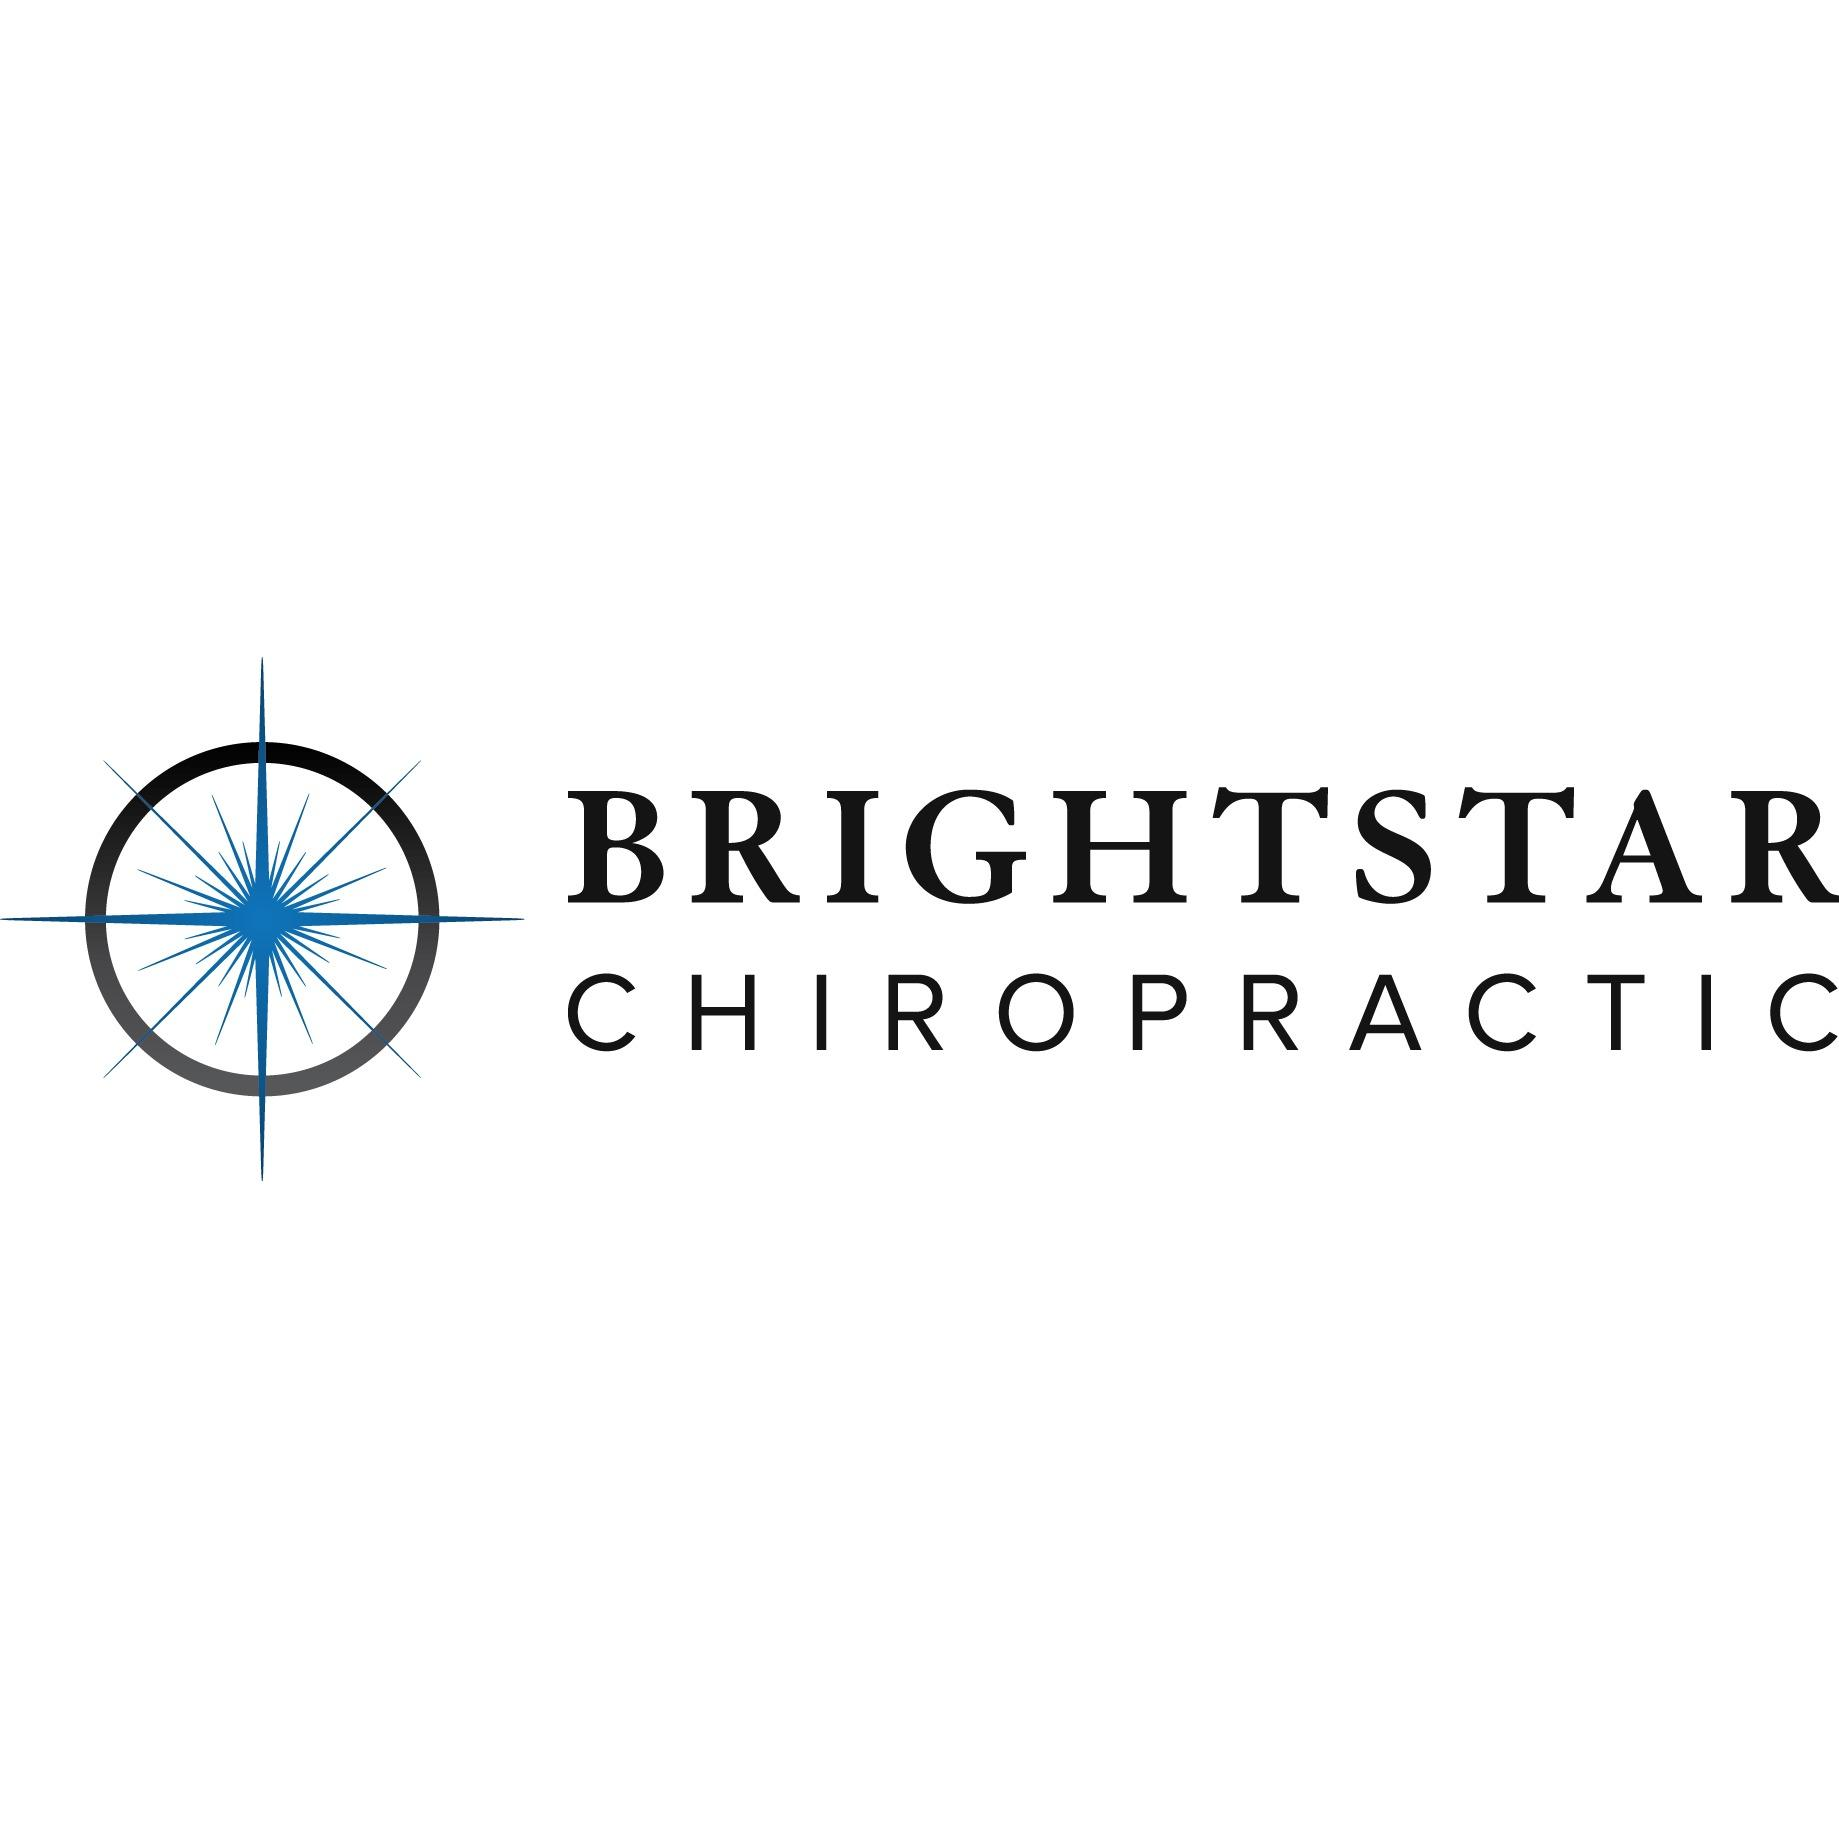 Brightstar Chiropractic & Progressive Rehab, LLC